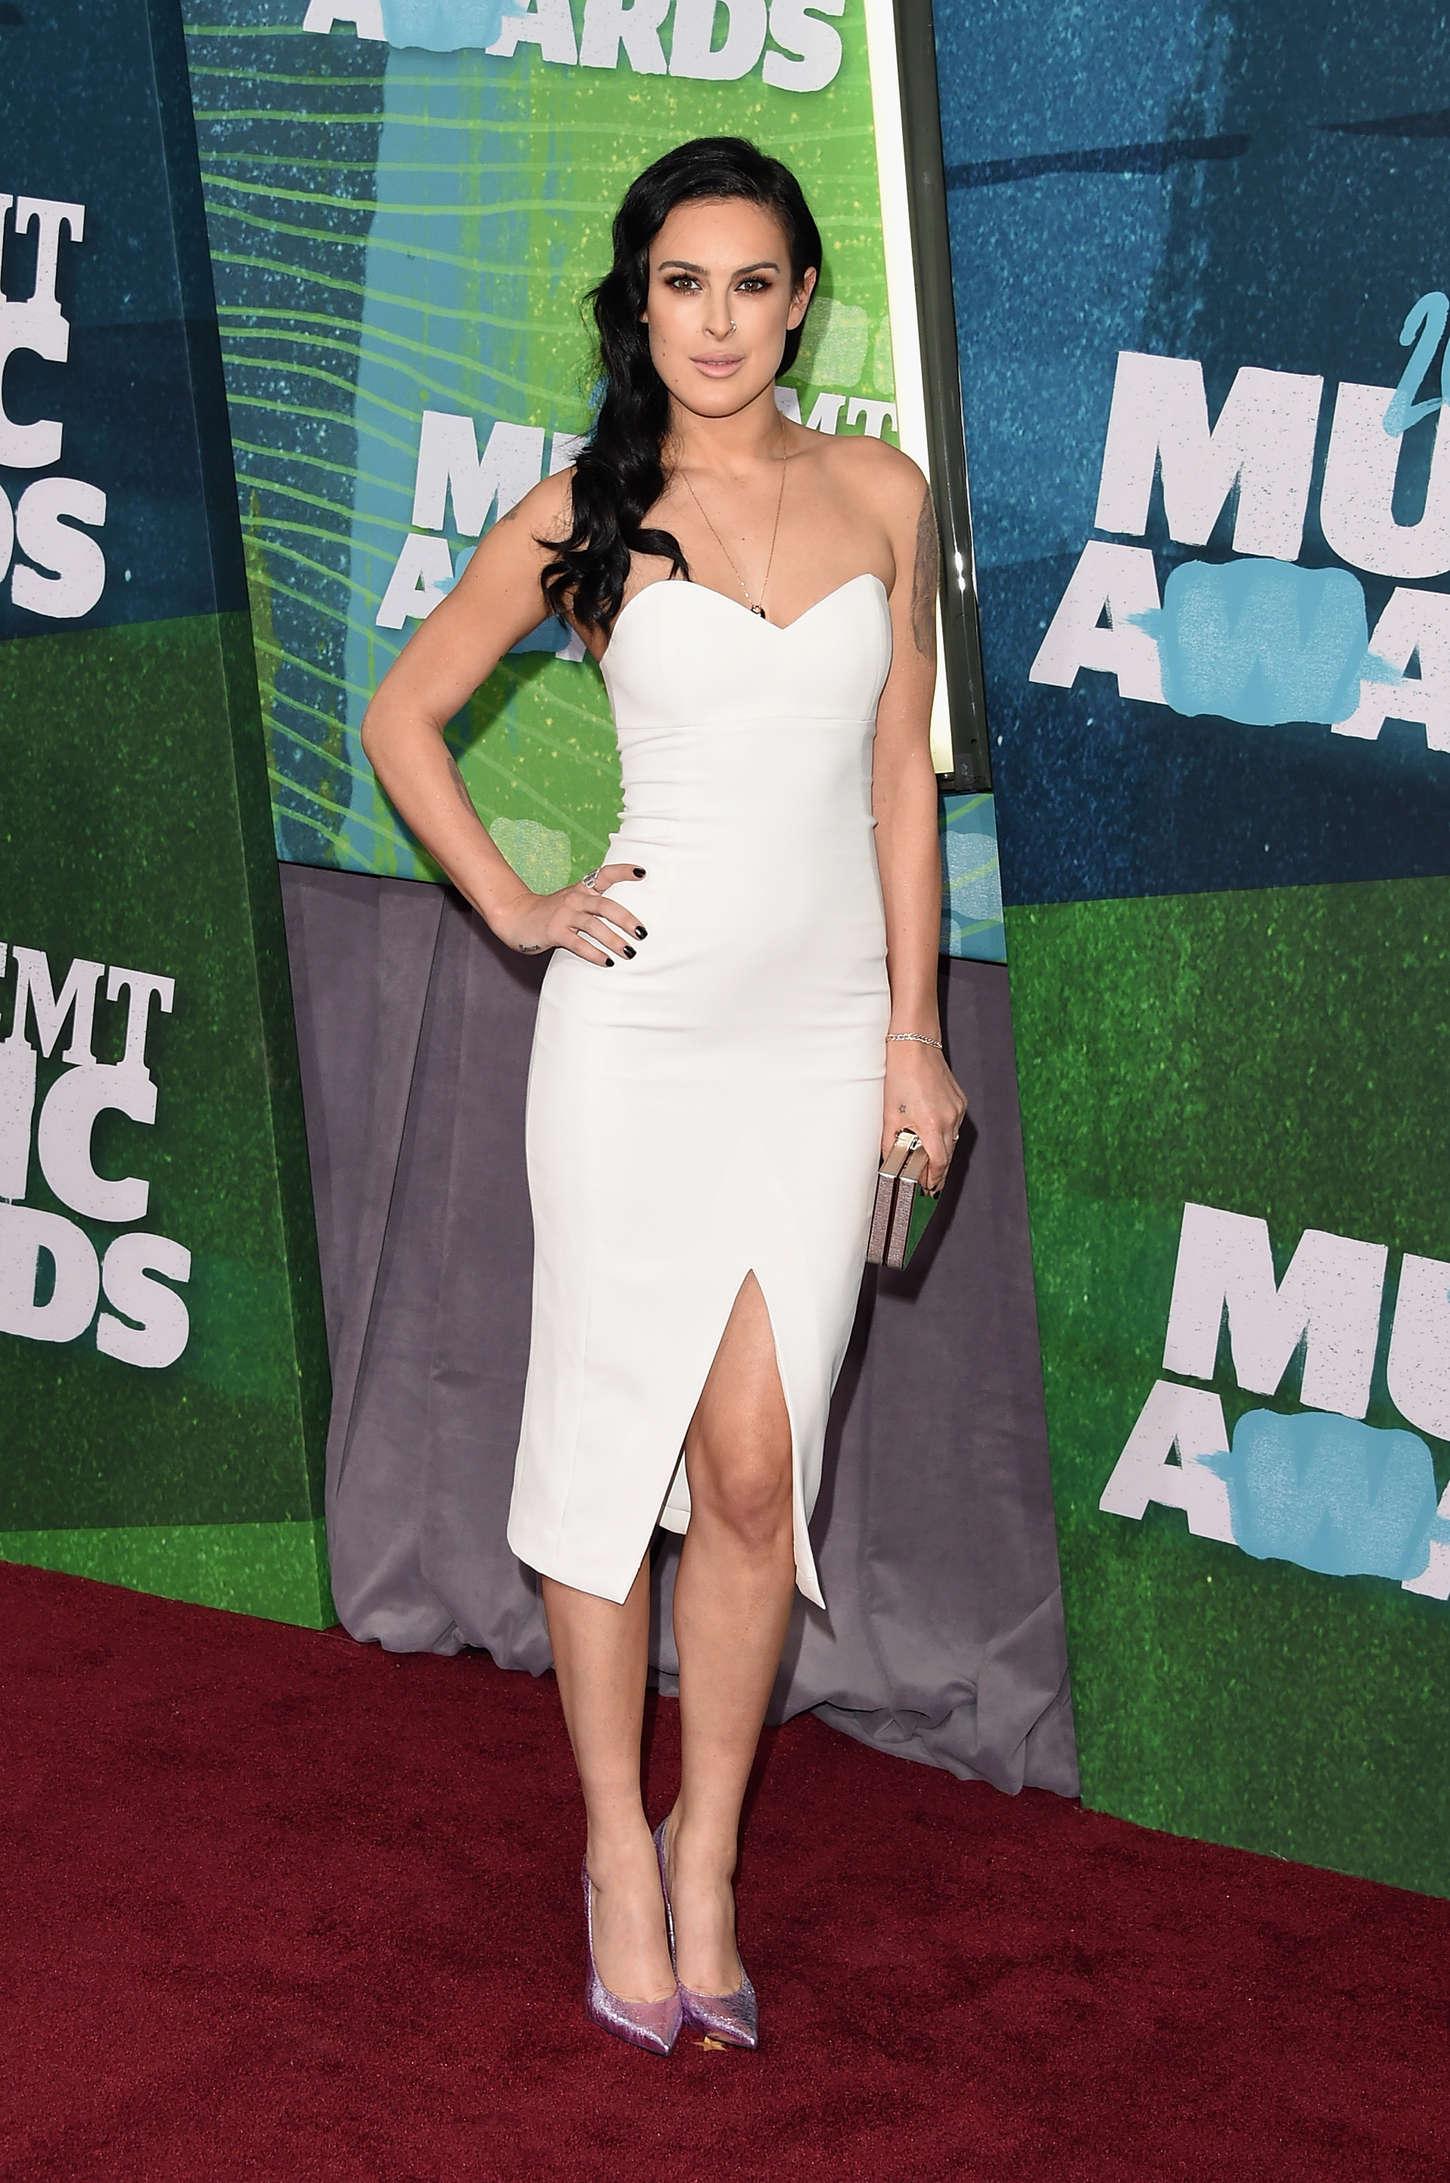 Rumer Willis 2015 : Rumer Willis: 2015 CMT Music Awards -02